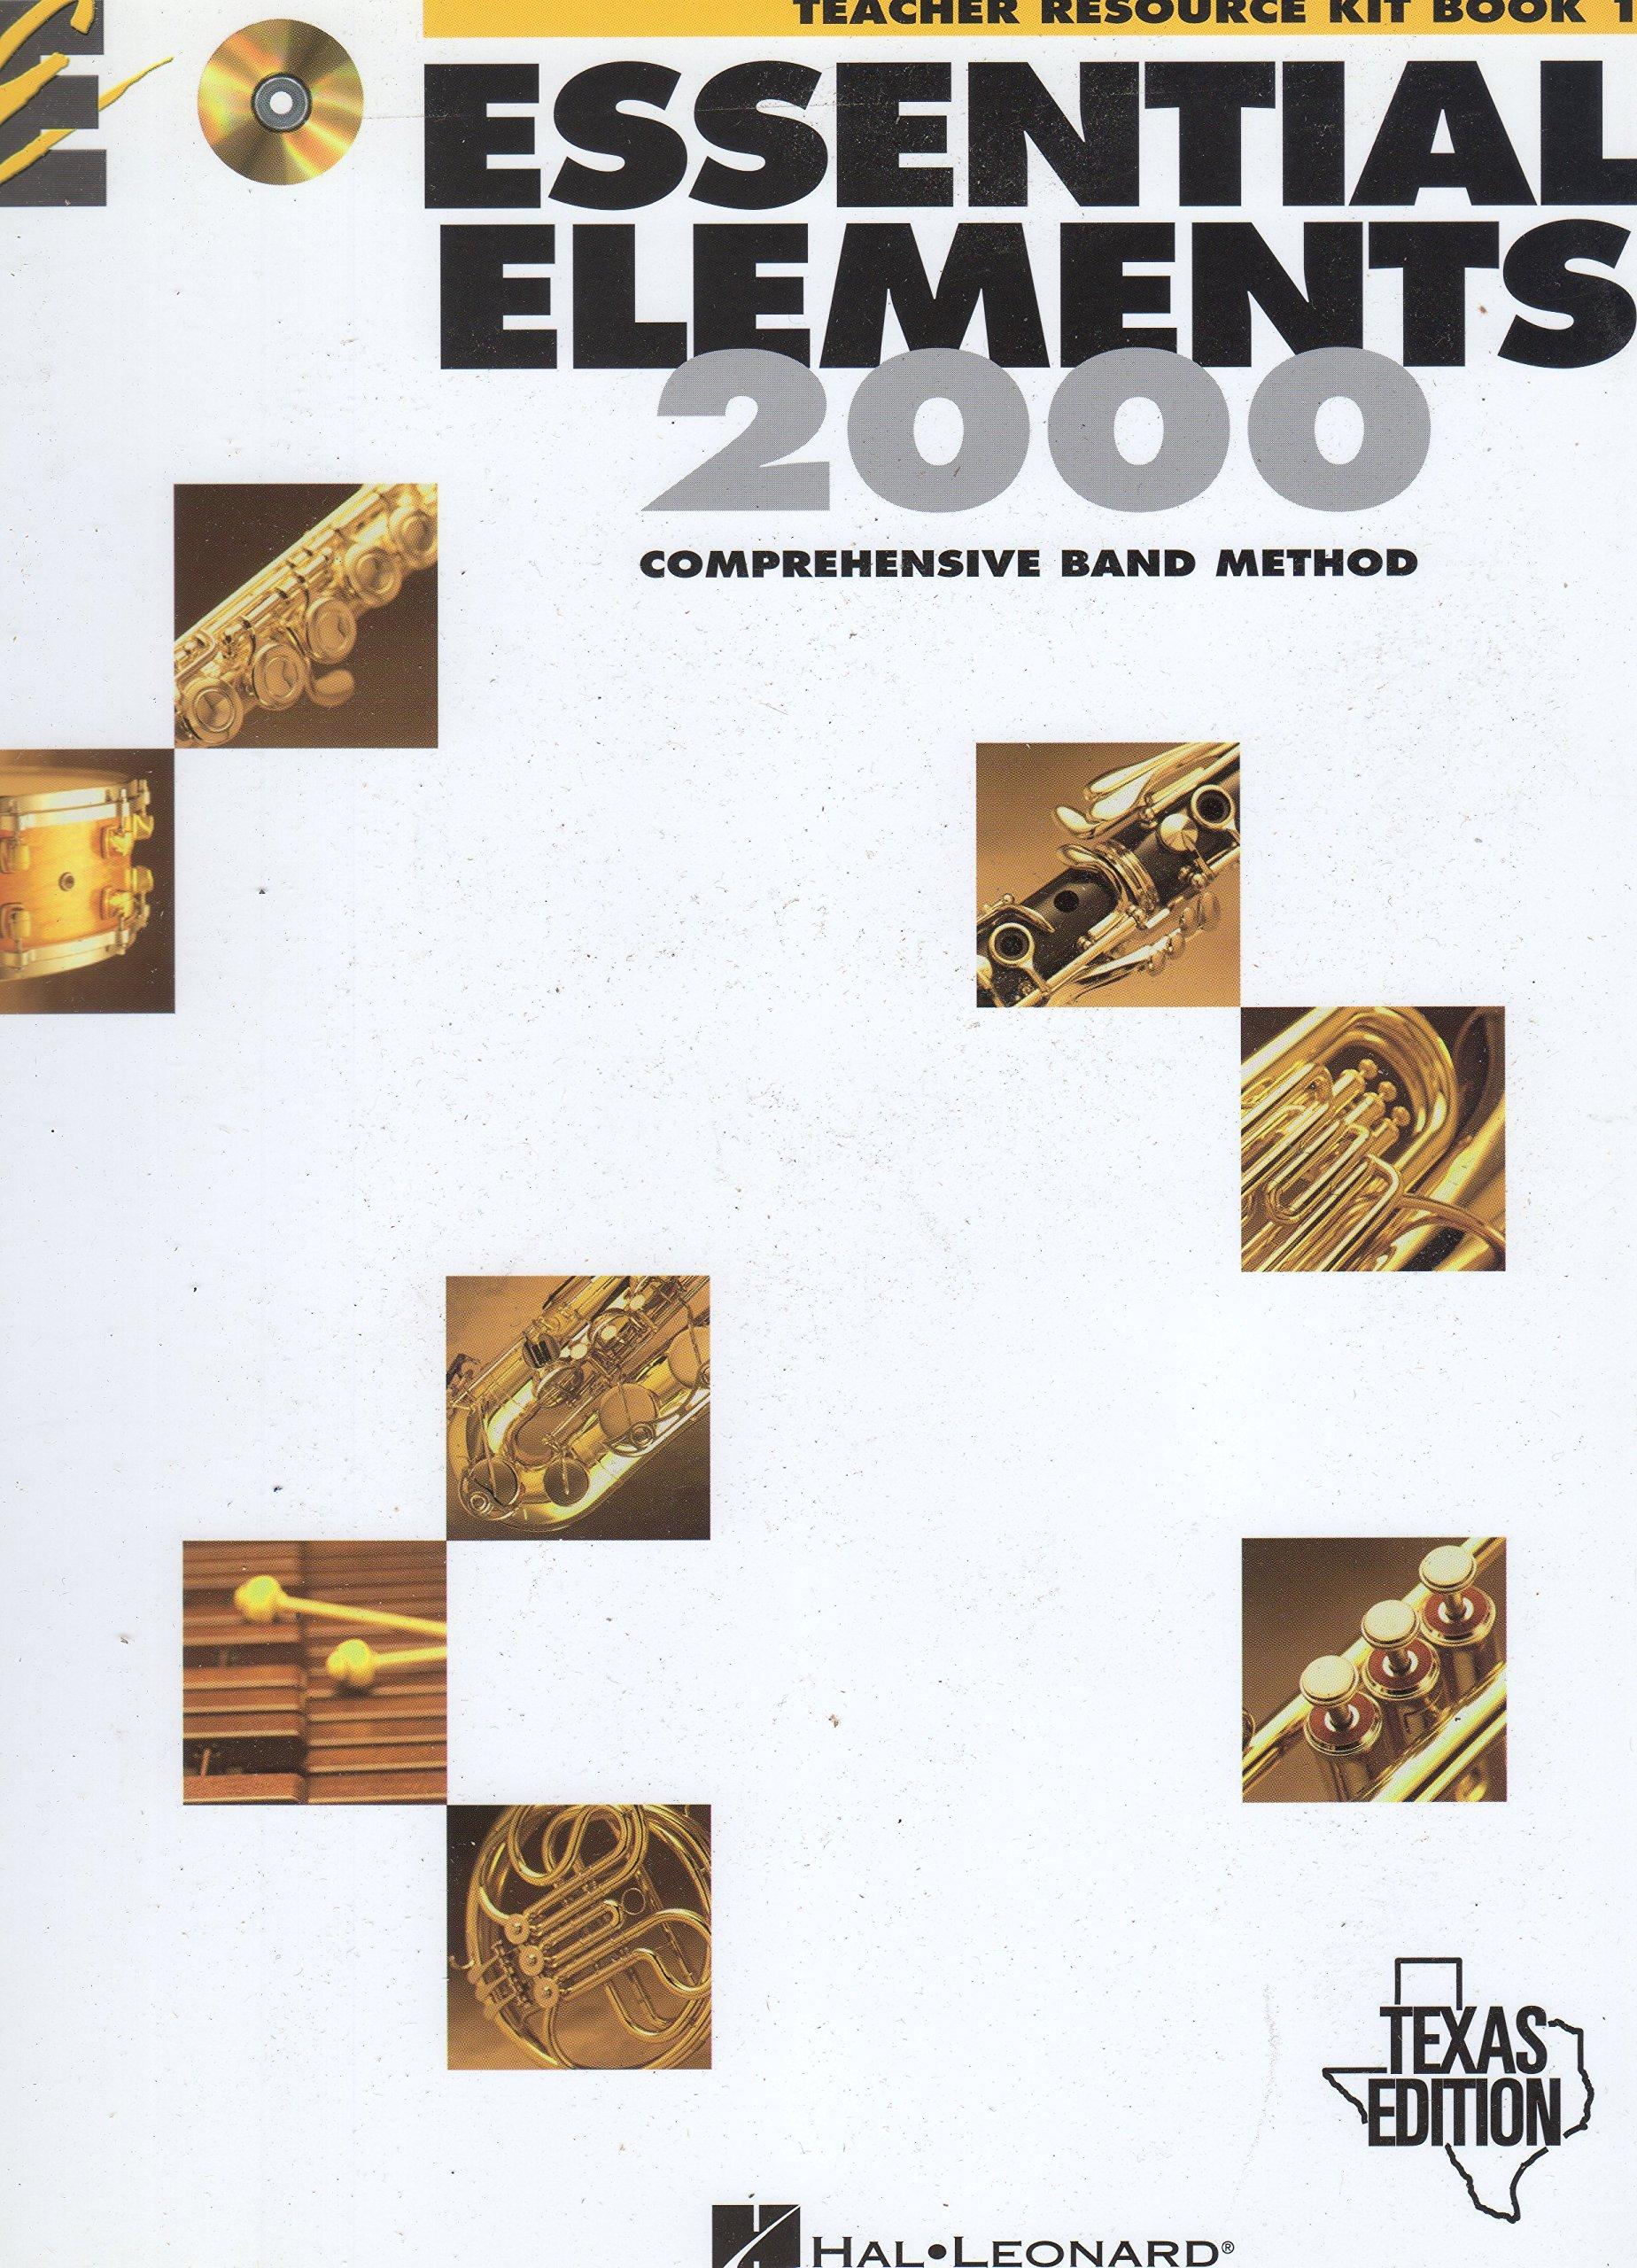 Read Online Essential Elements 2000: Comprehensive Band Method - Teacher Resource Kit Book 1, Texas edition PDF